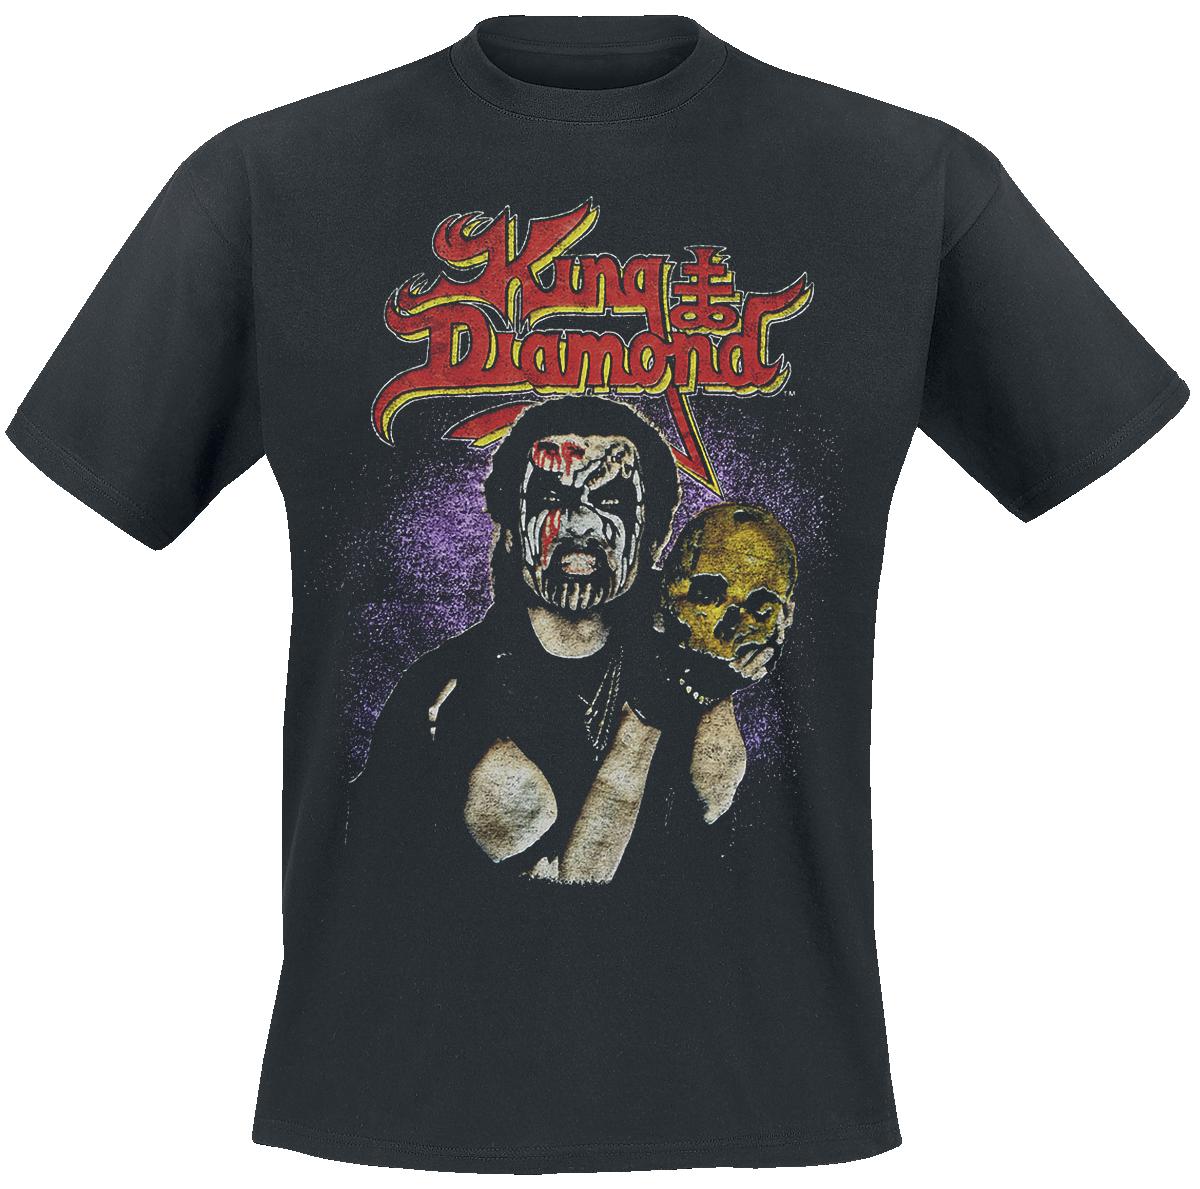 King Diamond - Conspiracy Tour 89 - T-Shirt - black image